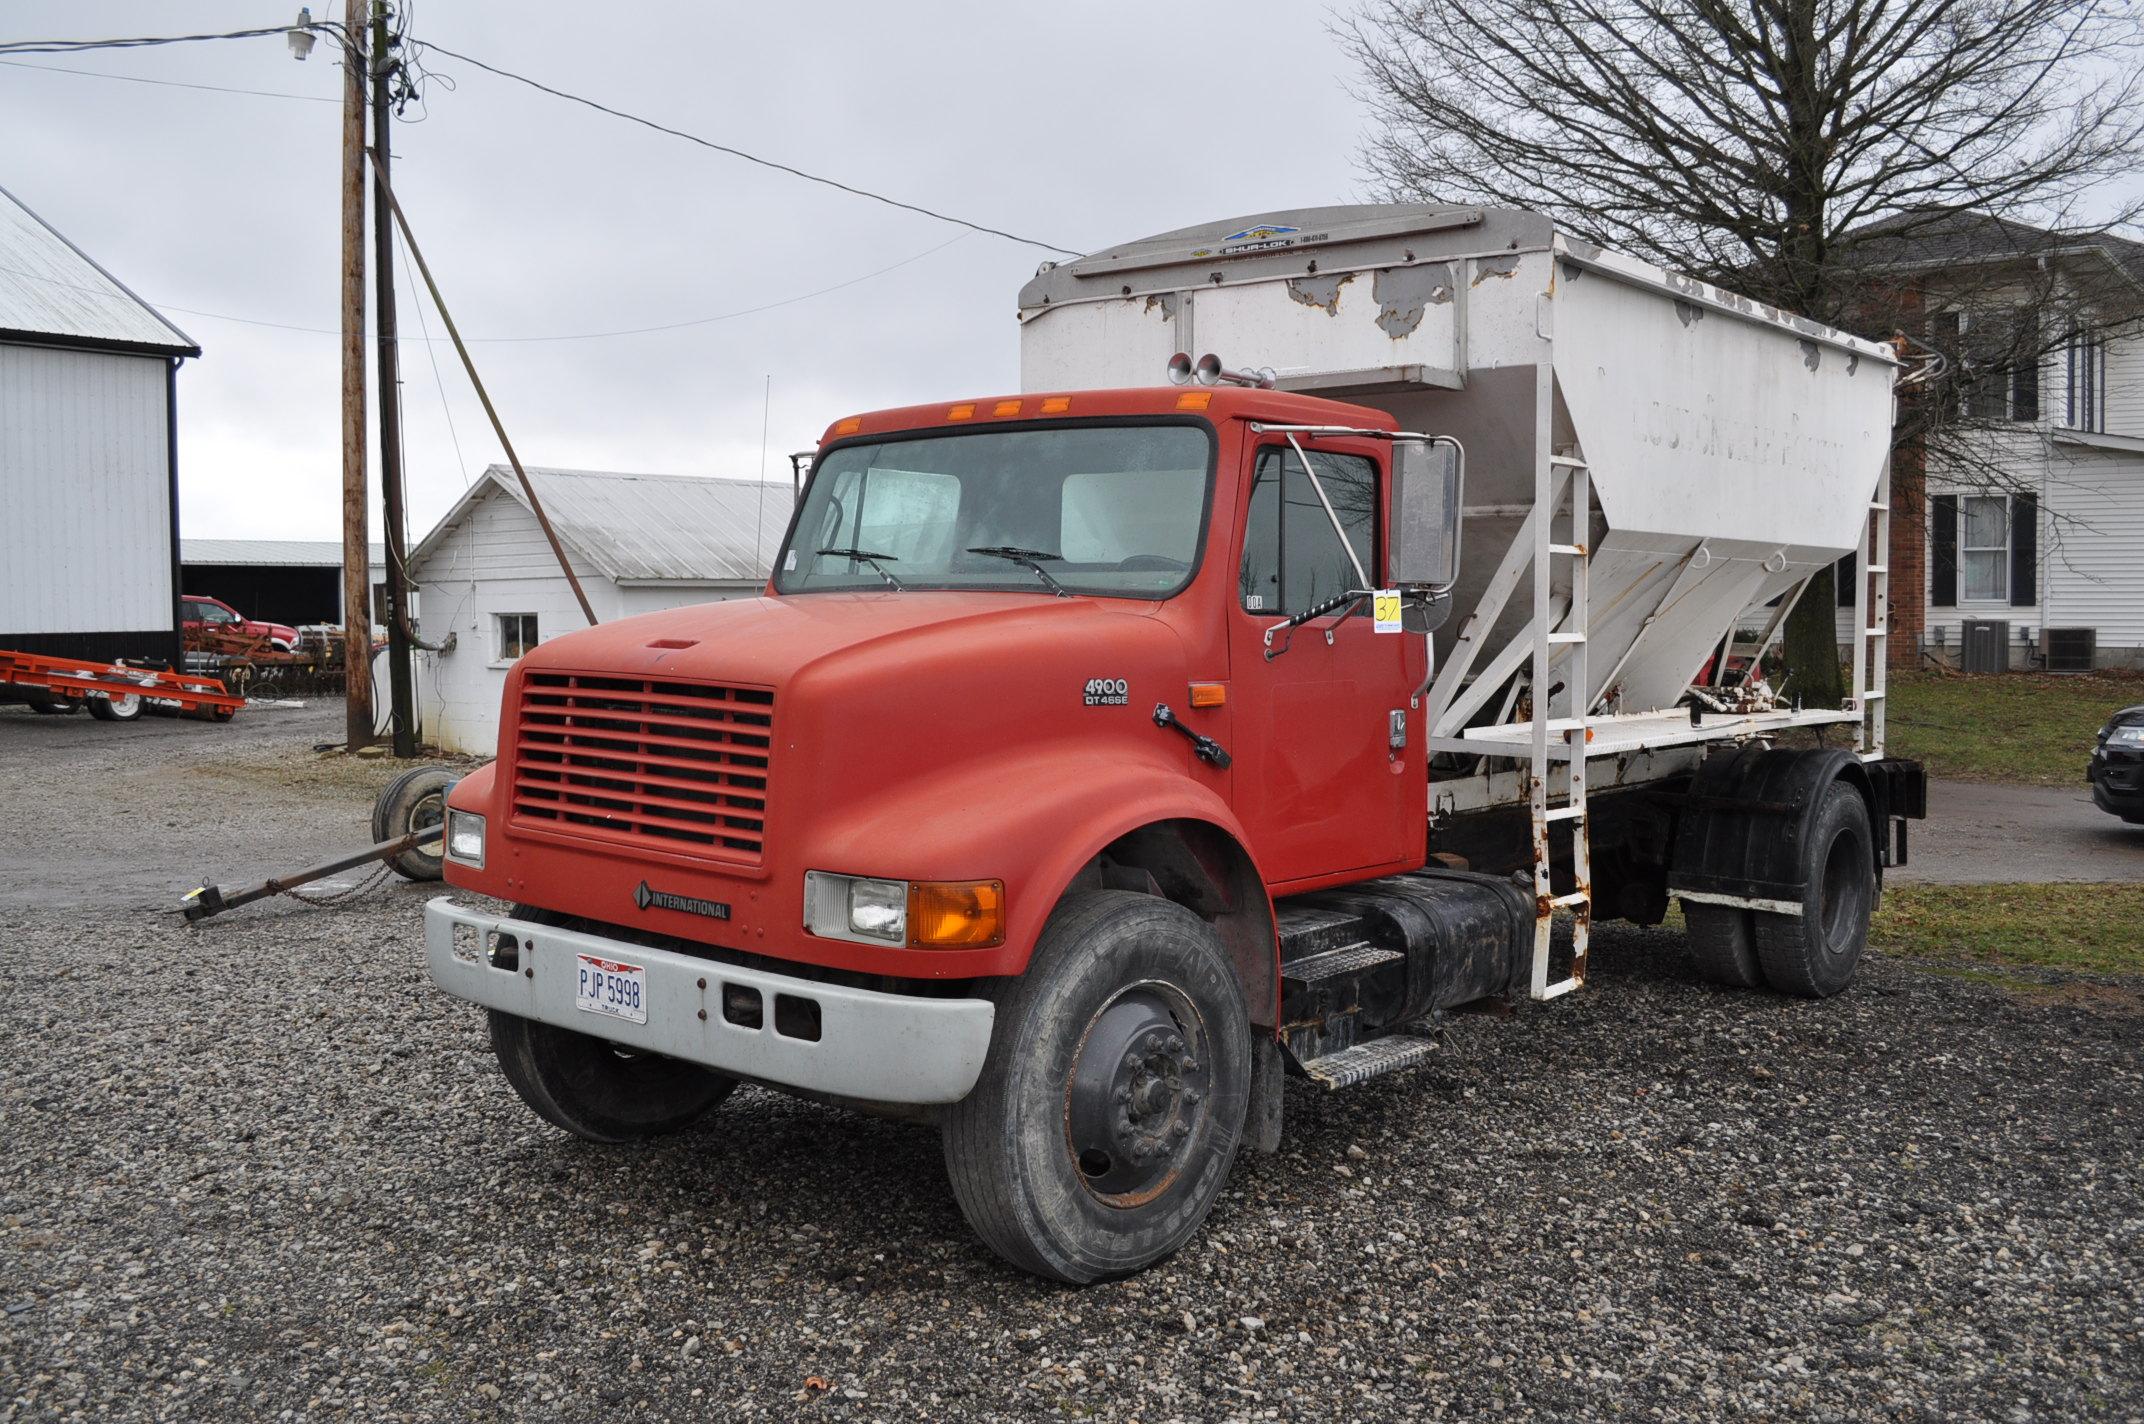 2000 International 4900 dry fertilizer tender truck, single axle, DT466E, Spicer 6 spd, spring ride,